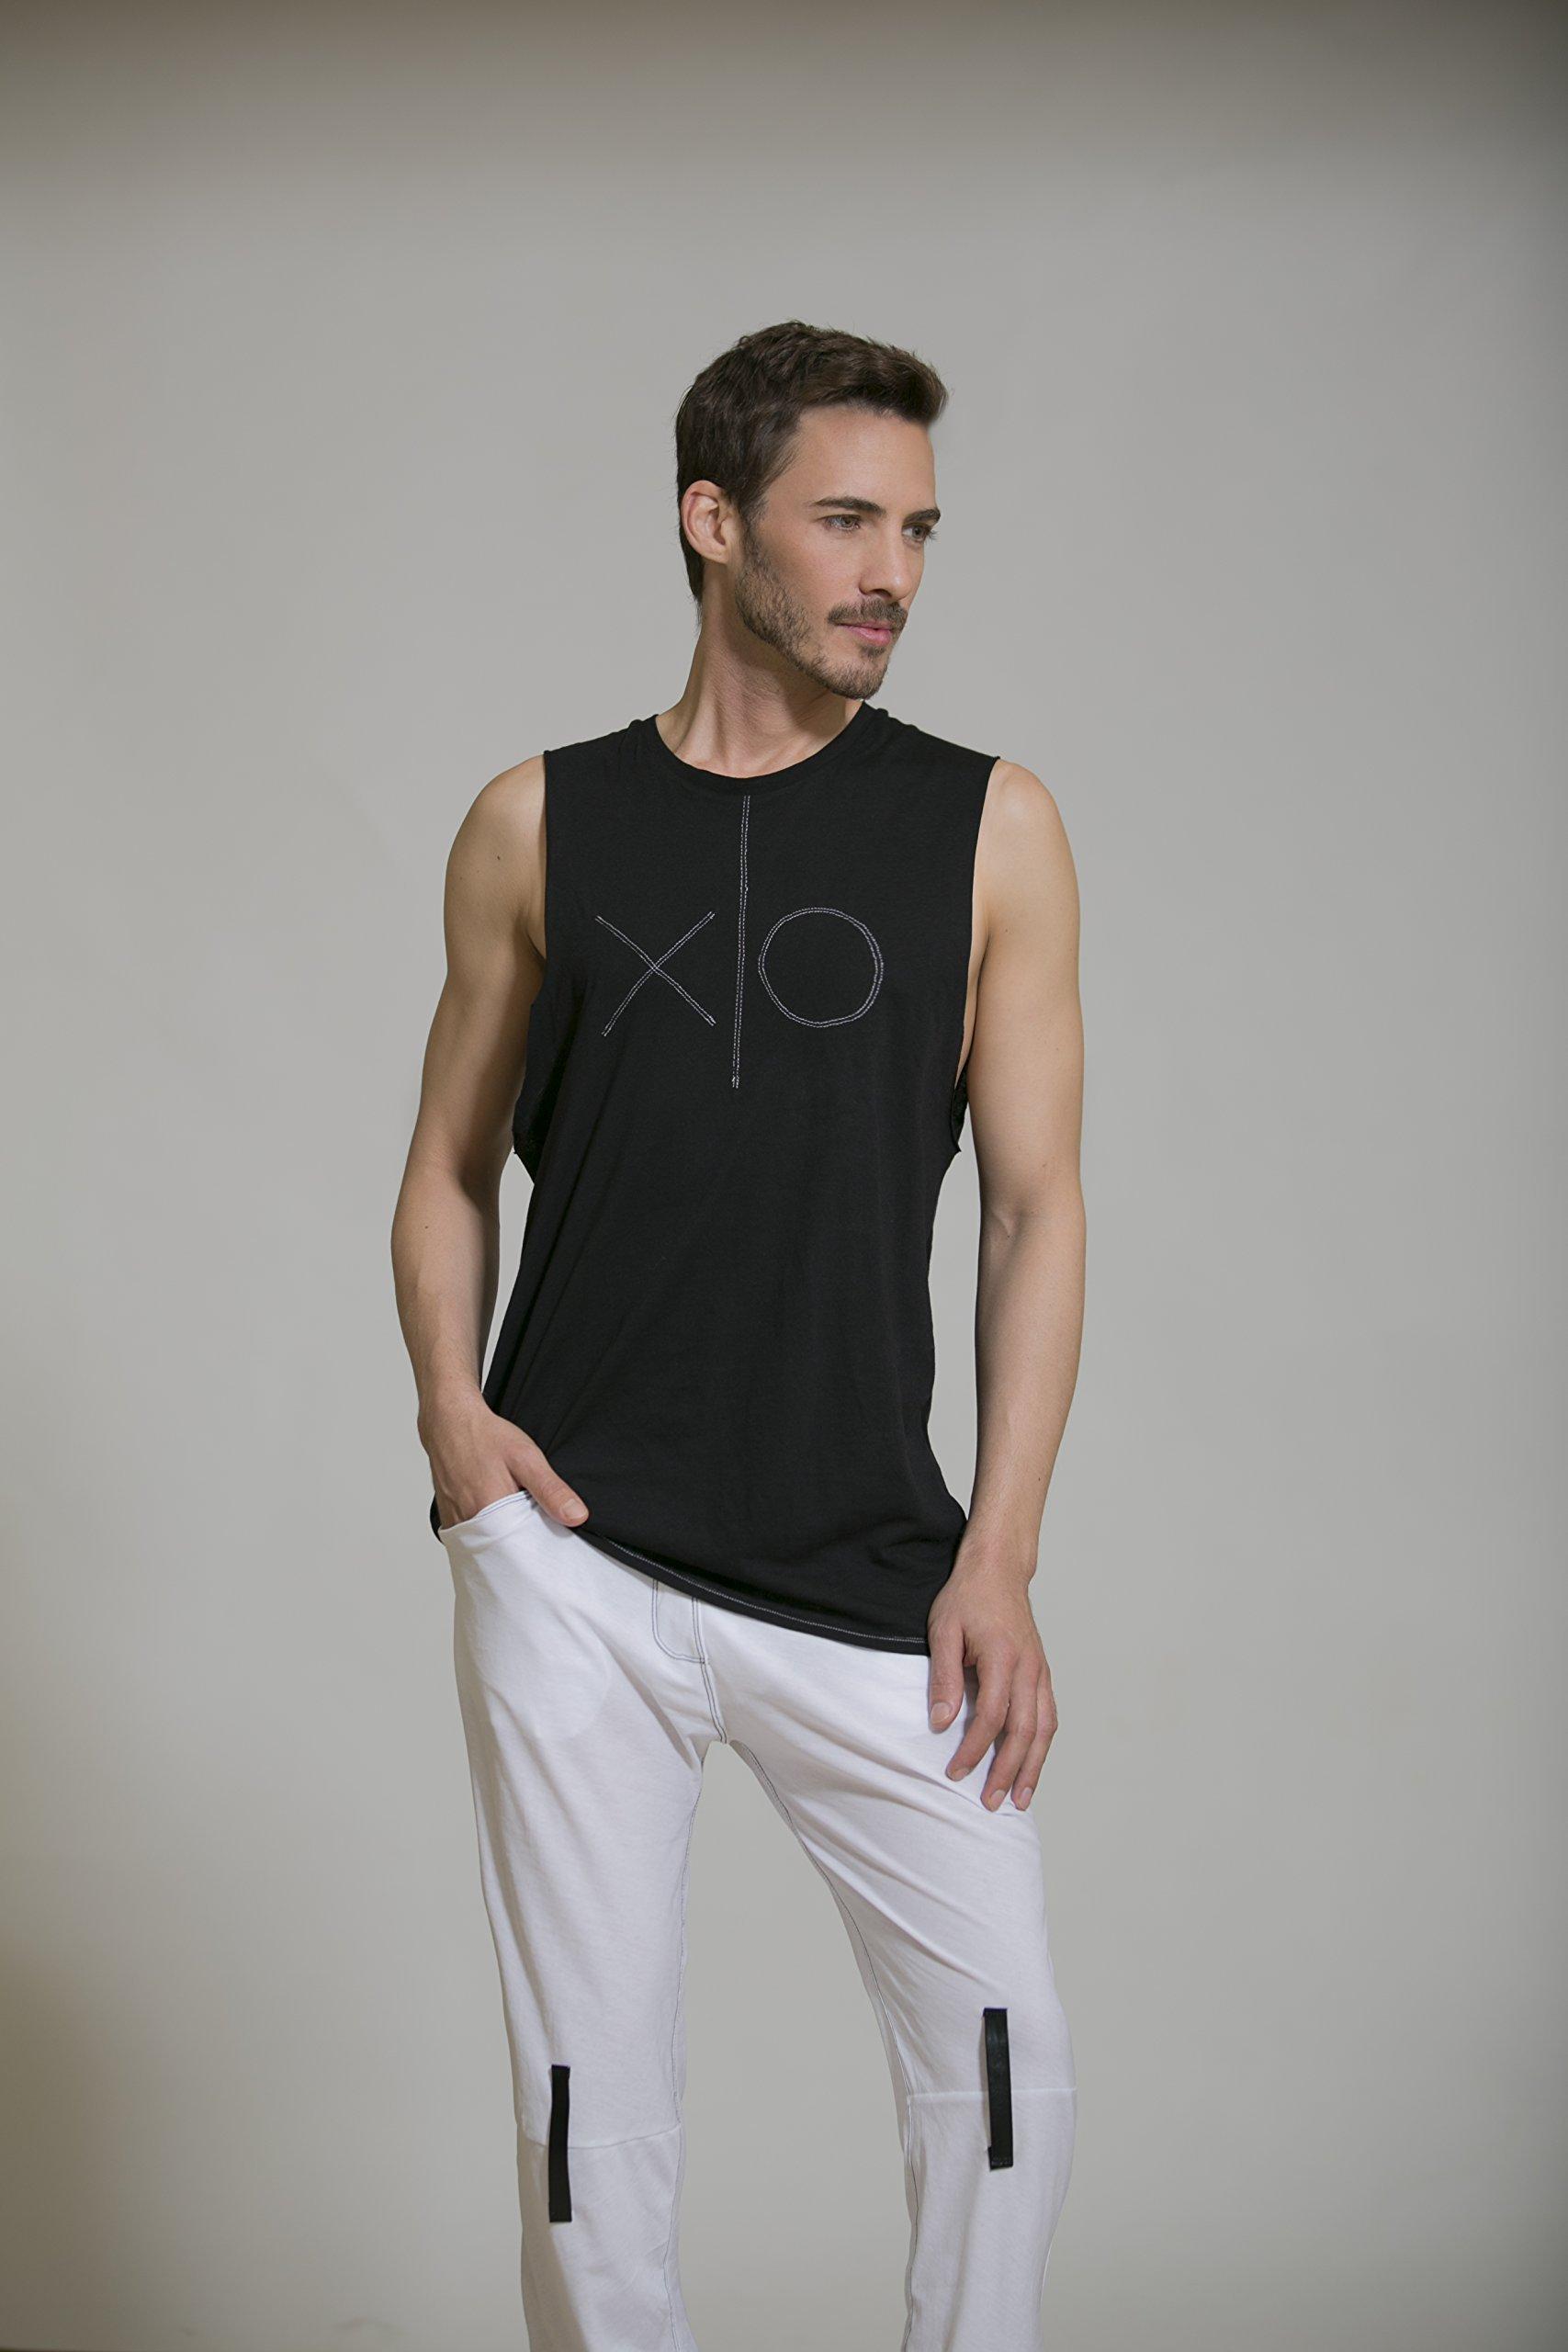 Men's black Top, mans Handmade shirt, Mens Black Shirt, Man shirt, man Design T-shirt, Mens clothing, Unique shirt, Mens fashion clothing